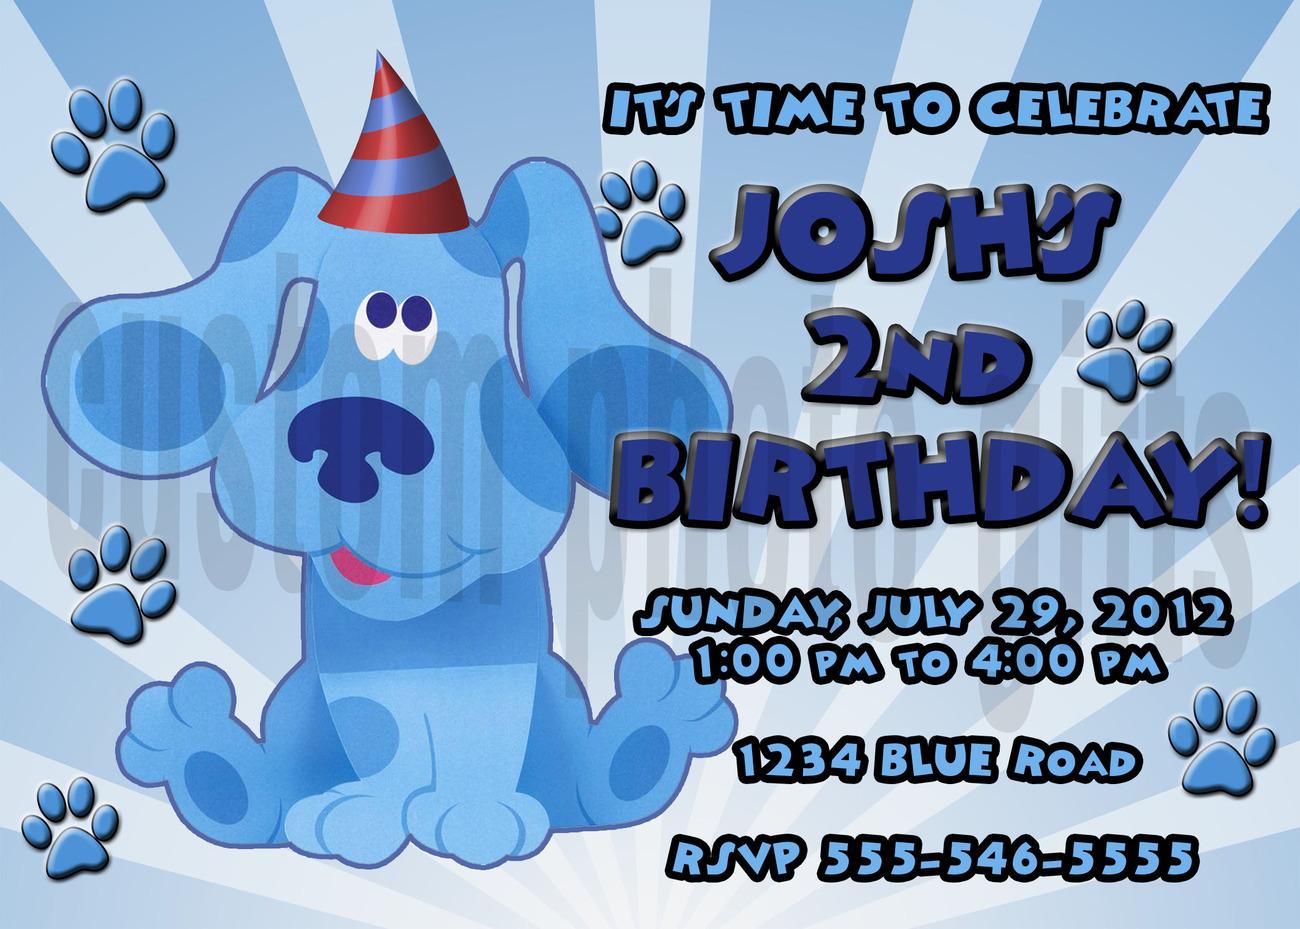 Blues clues birthday invitation